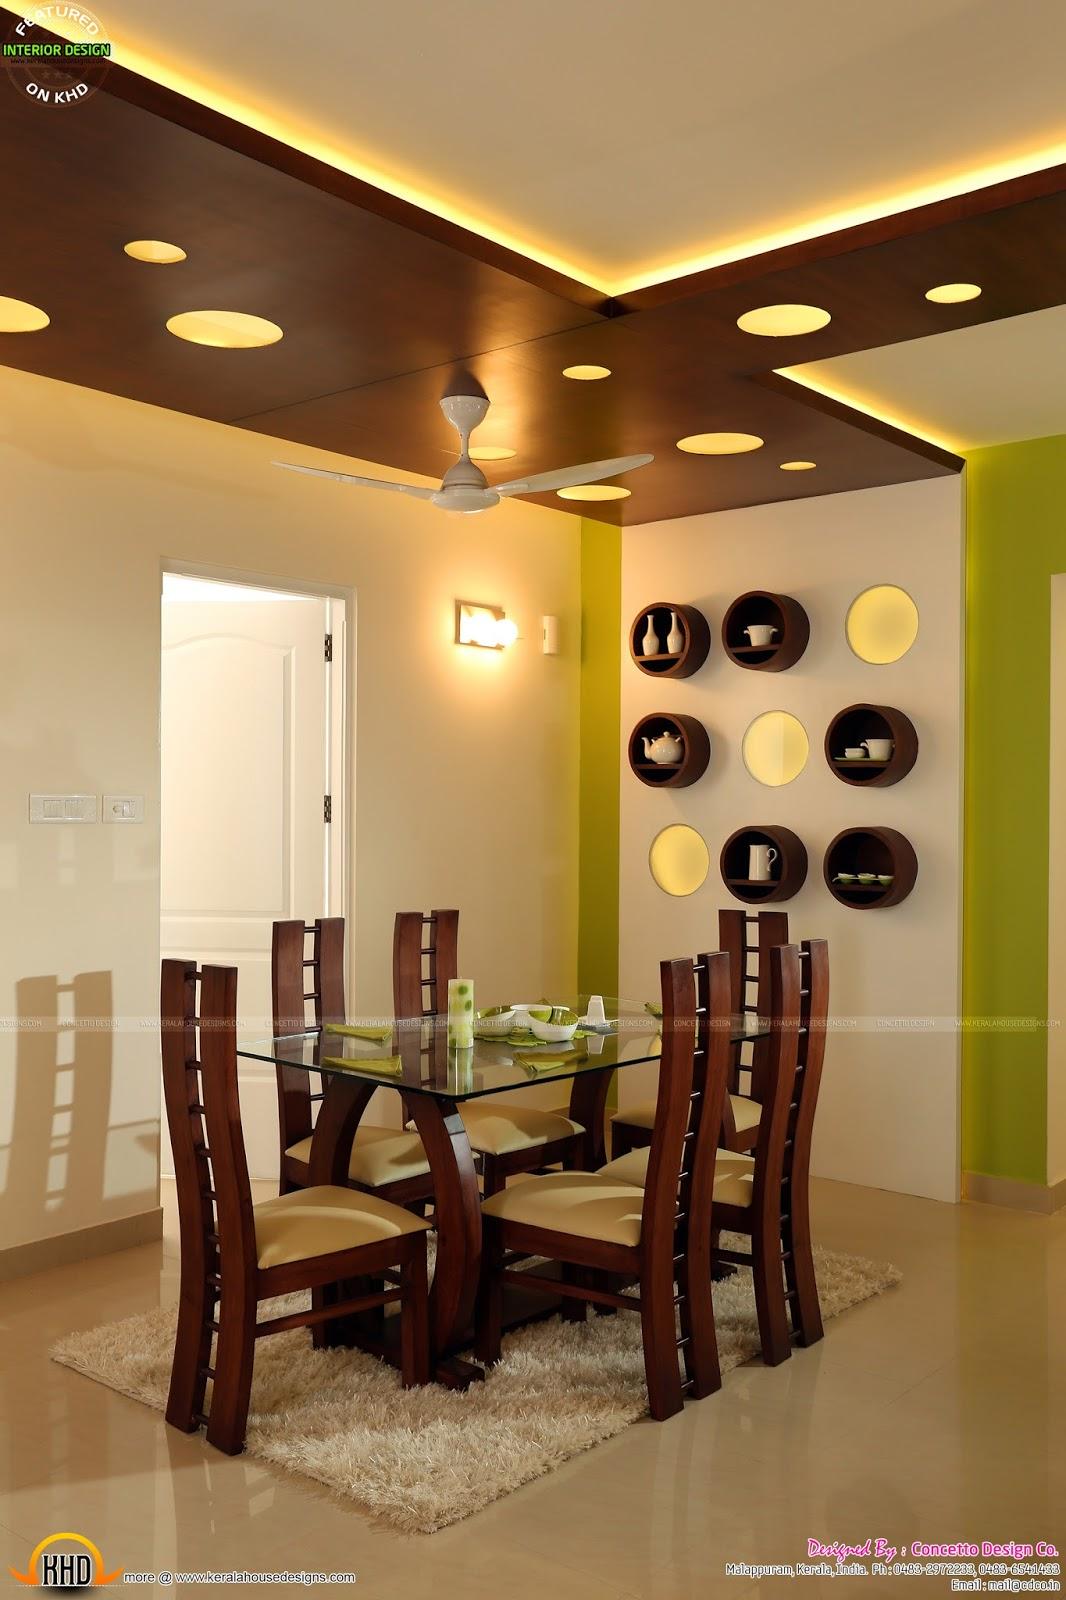 Kerala flat interior design - Kerala home design and floor ...